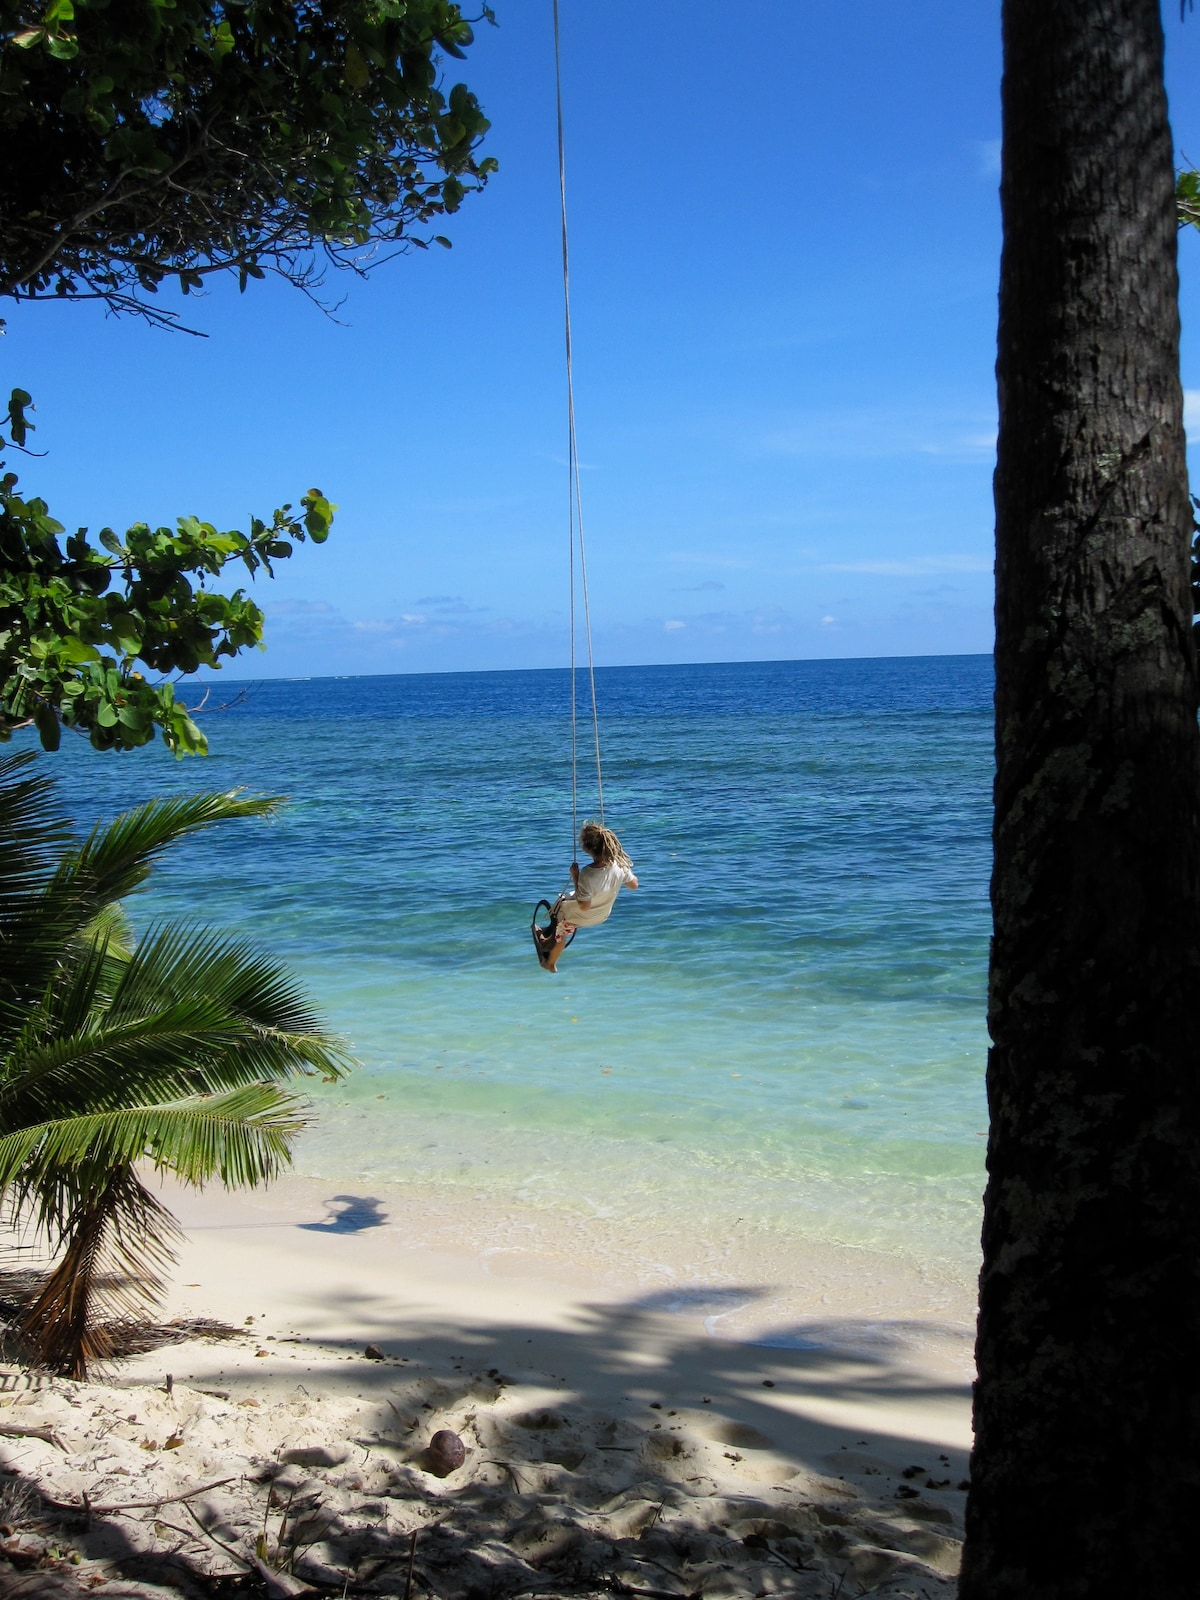 Henry from Taveuni Island